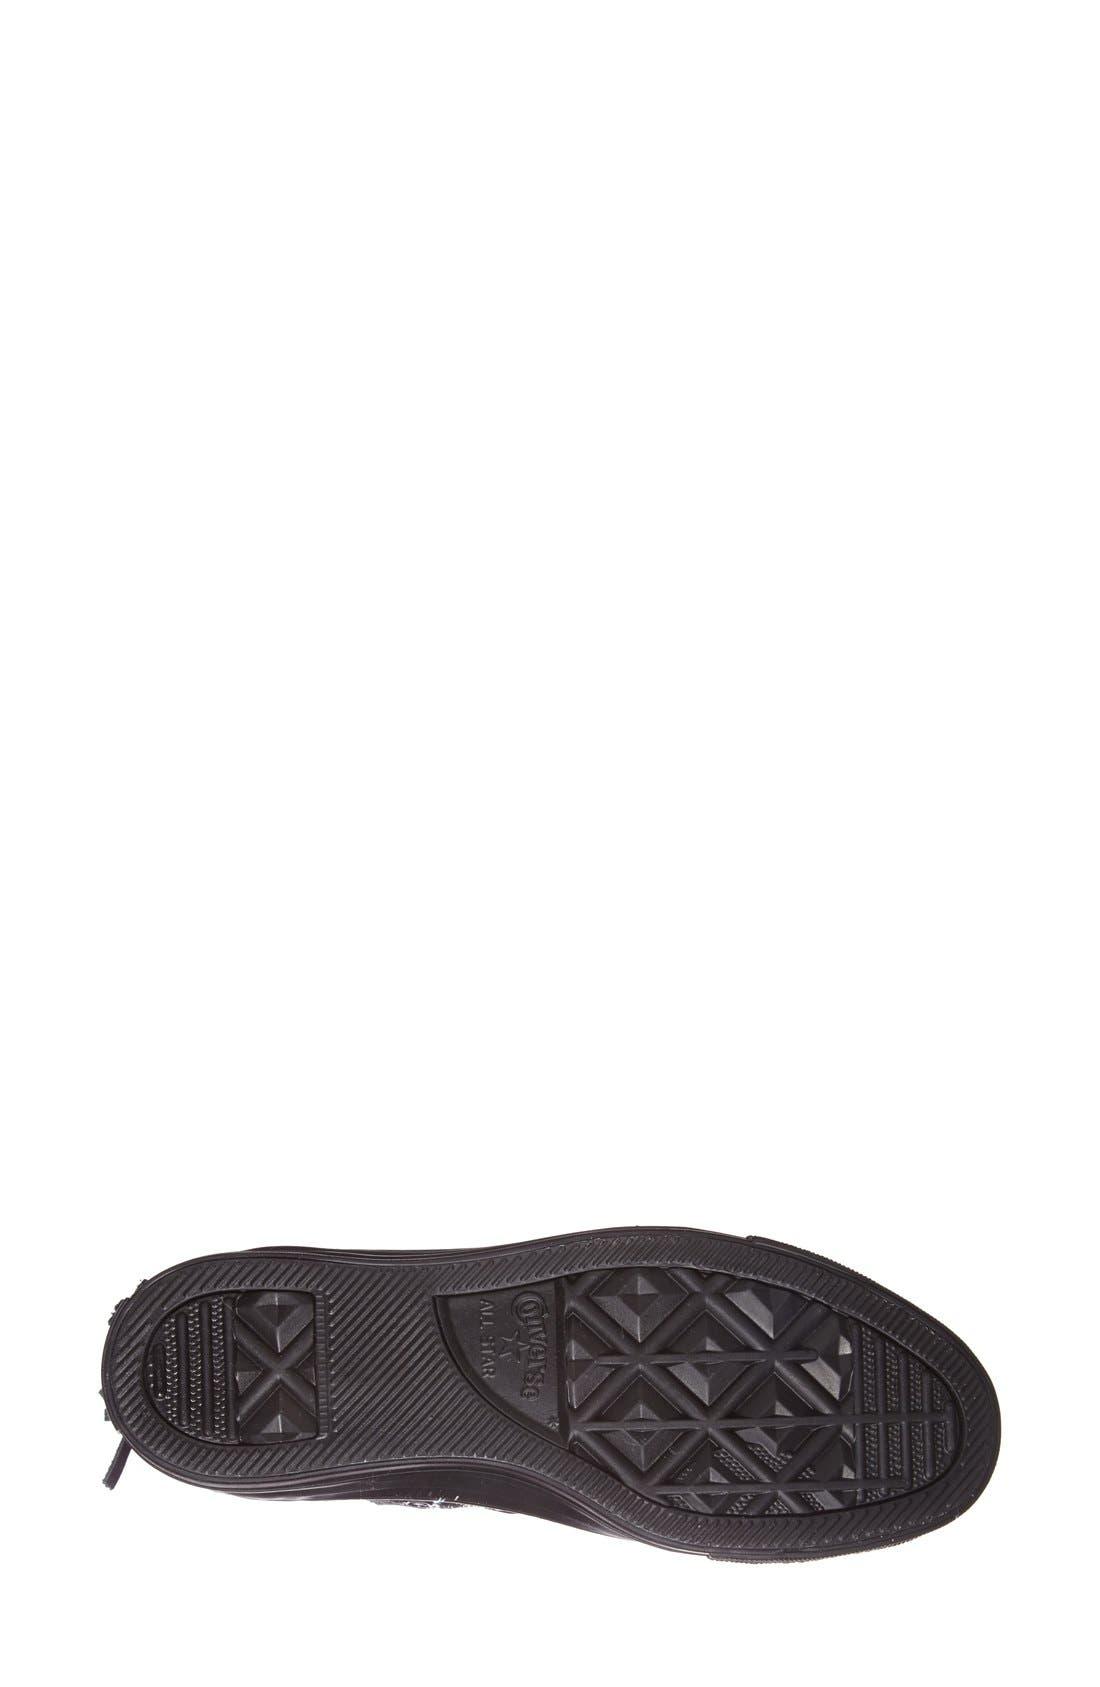 Alternate Image 4  - Converse Chuck Taylor® All Star® 'Tri Zip' High Top Sneaker (Women)